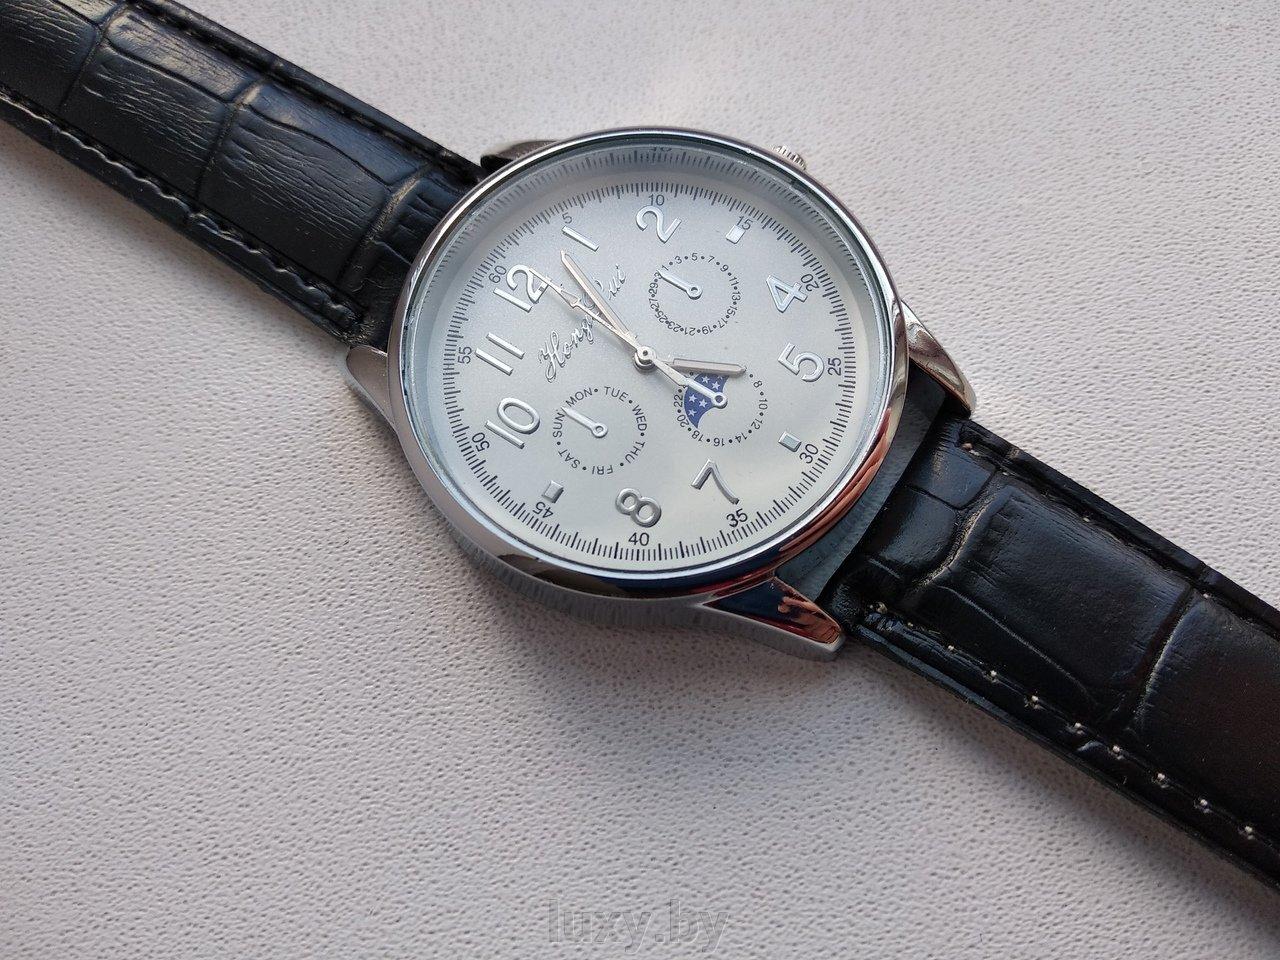 Часы наручные, ремешок черный,, арт. Н-61 - фото pic_5b2506c9cfdf16e_1920x9000_1.jpg